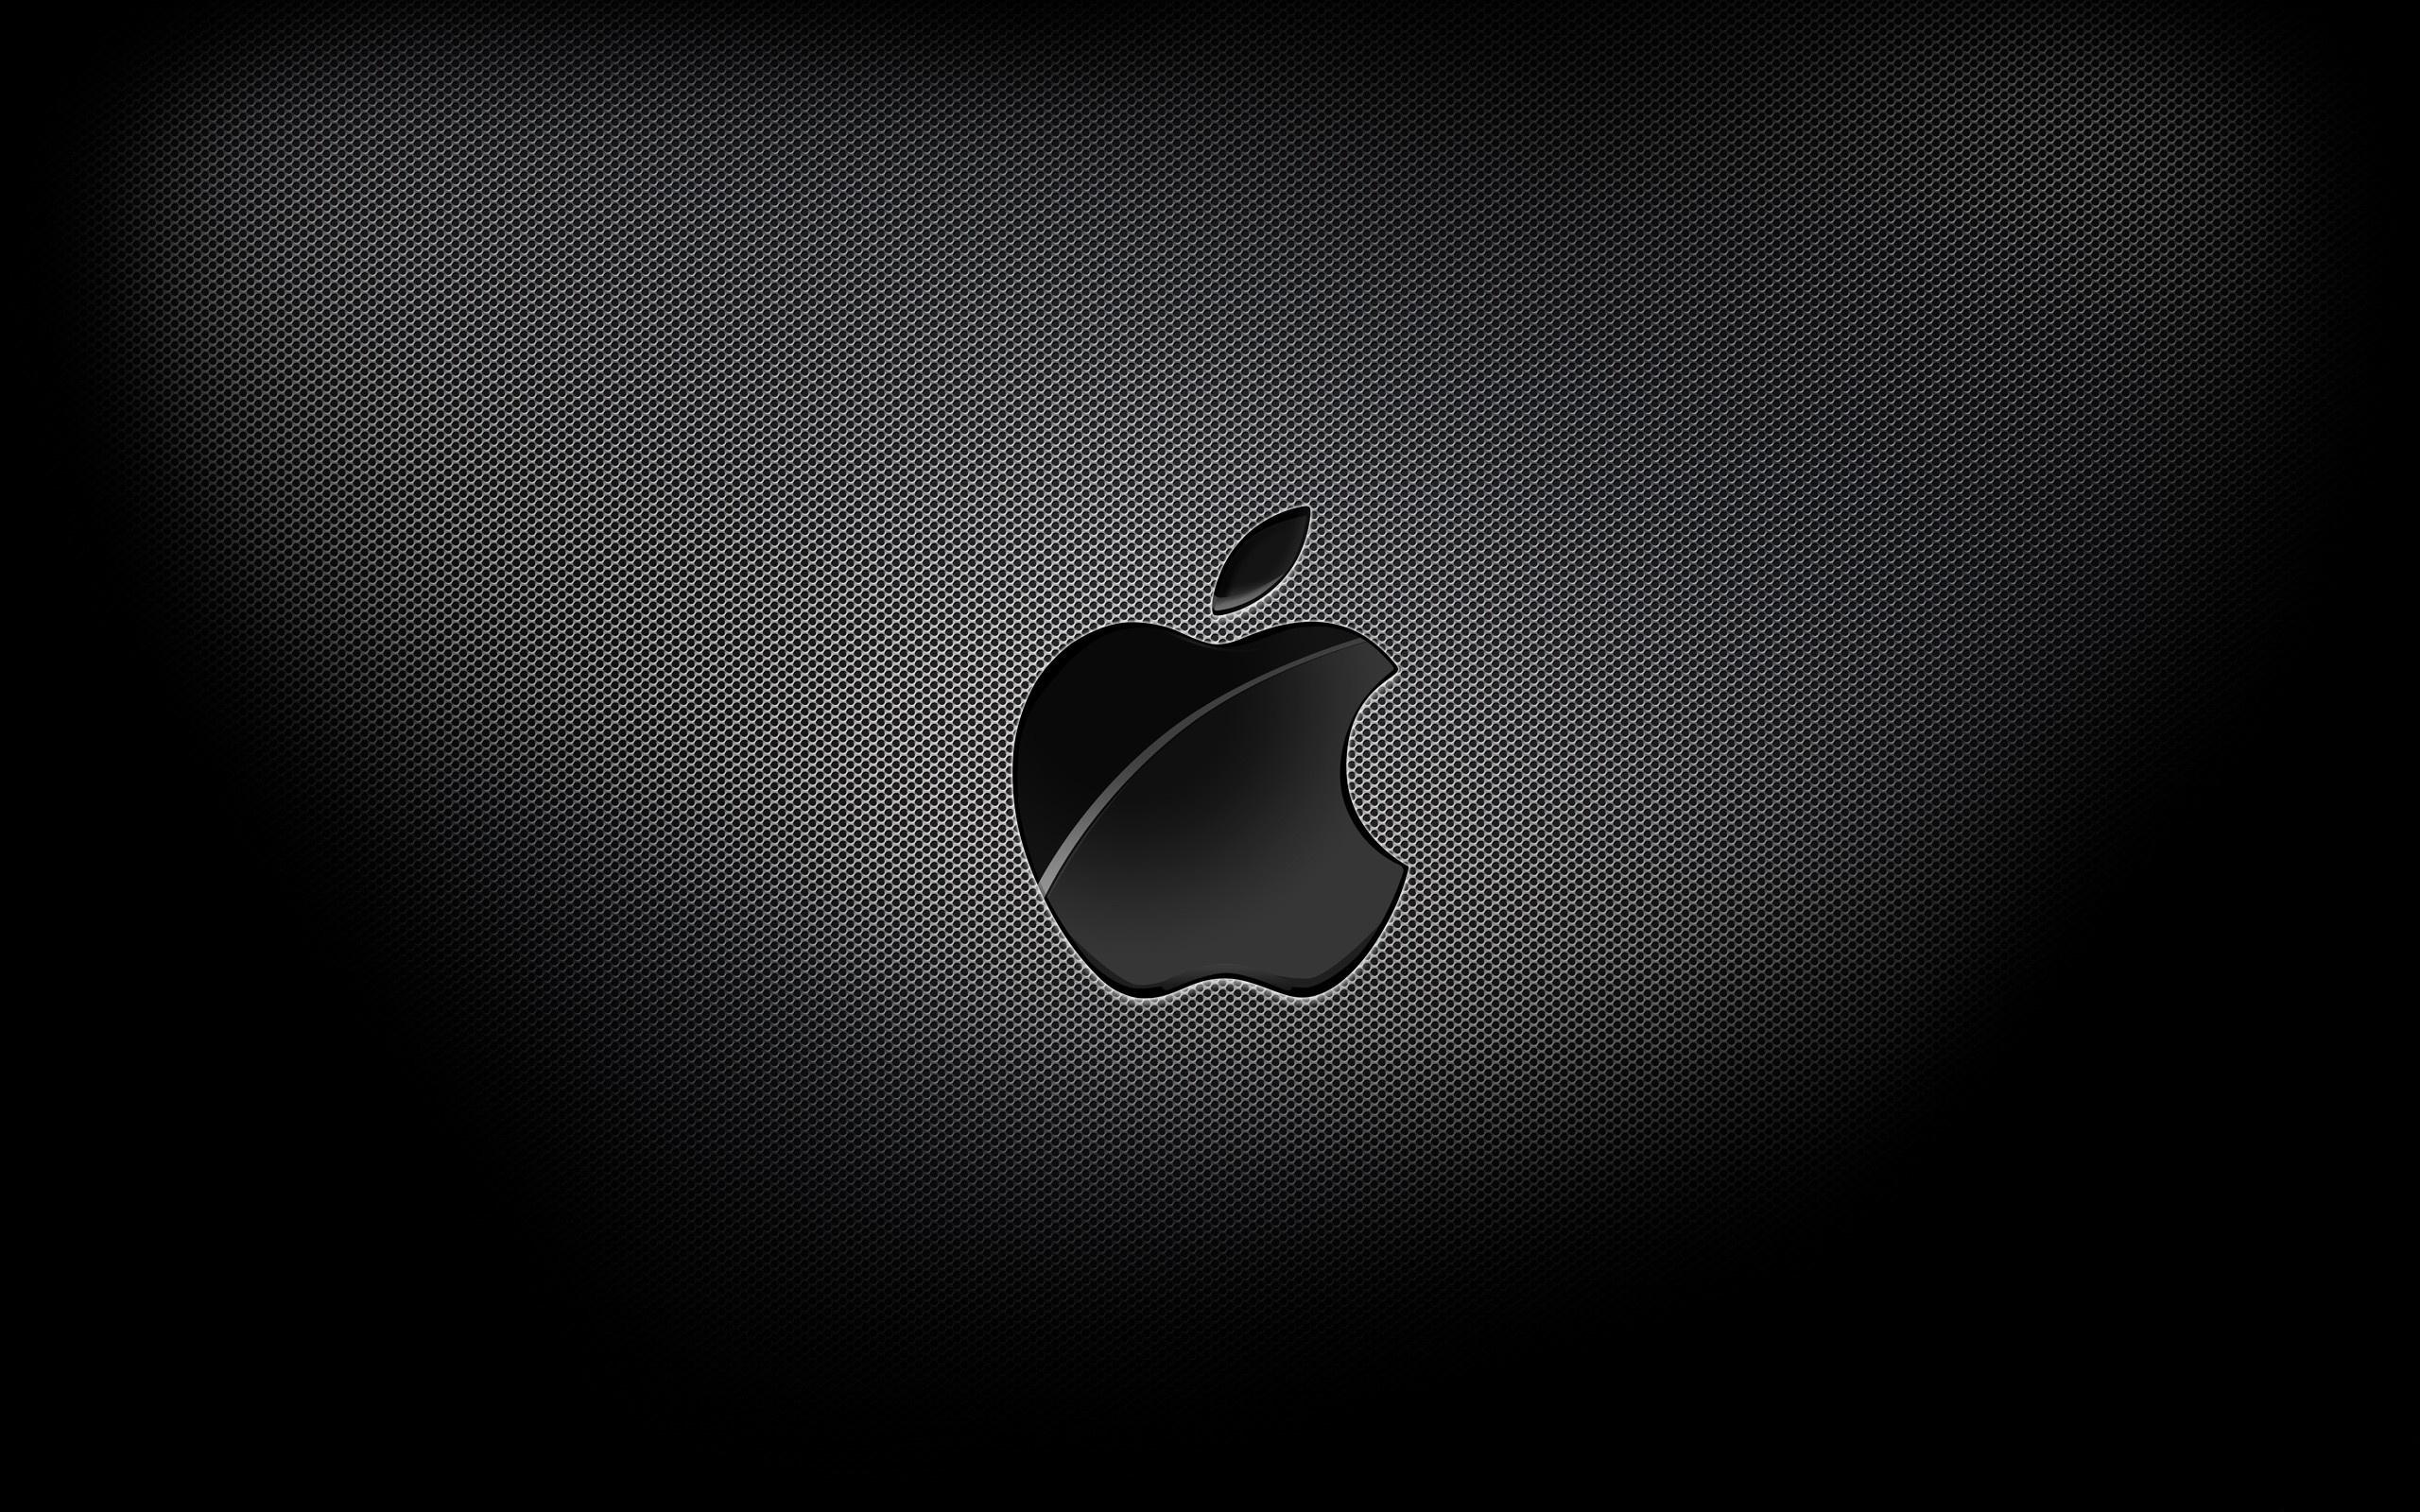 Black Background Mac Wallpaper Download Mac Wallpapers Download 2560x1600